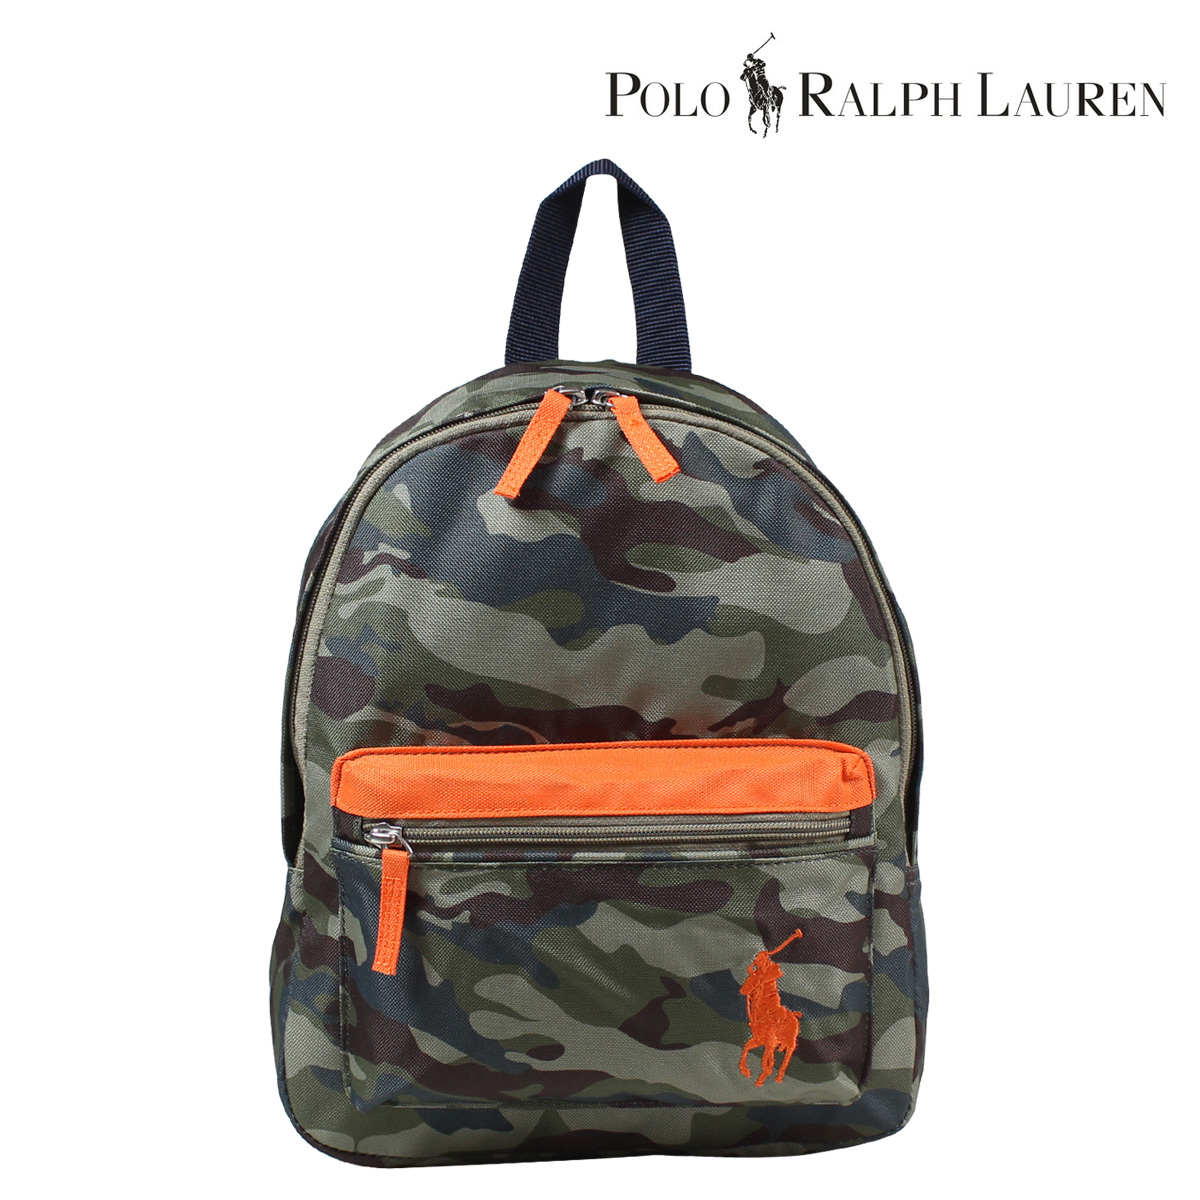 797f9658c7 Sugar Online Shop  Polo Ralph Lauren POLO RALPH LAUREN Backpack ...